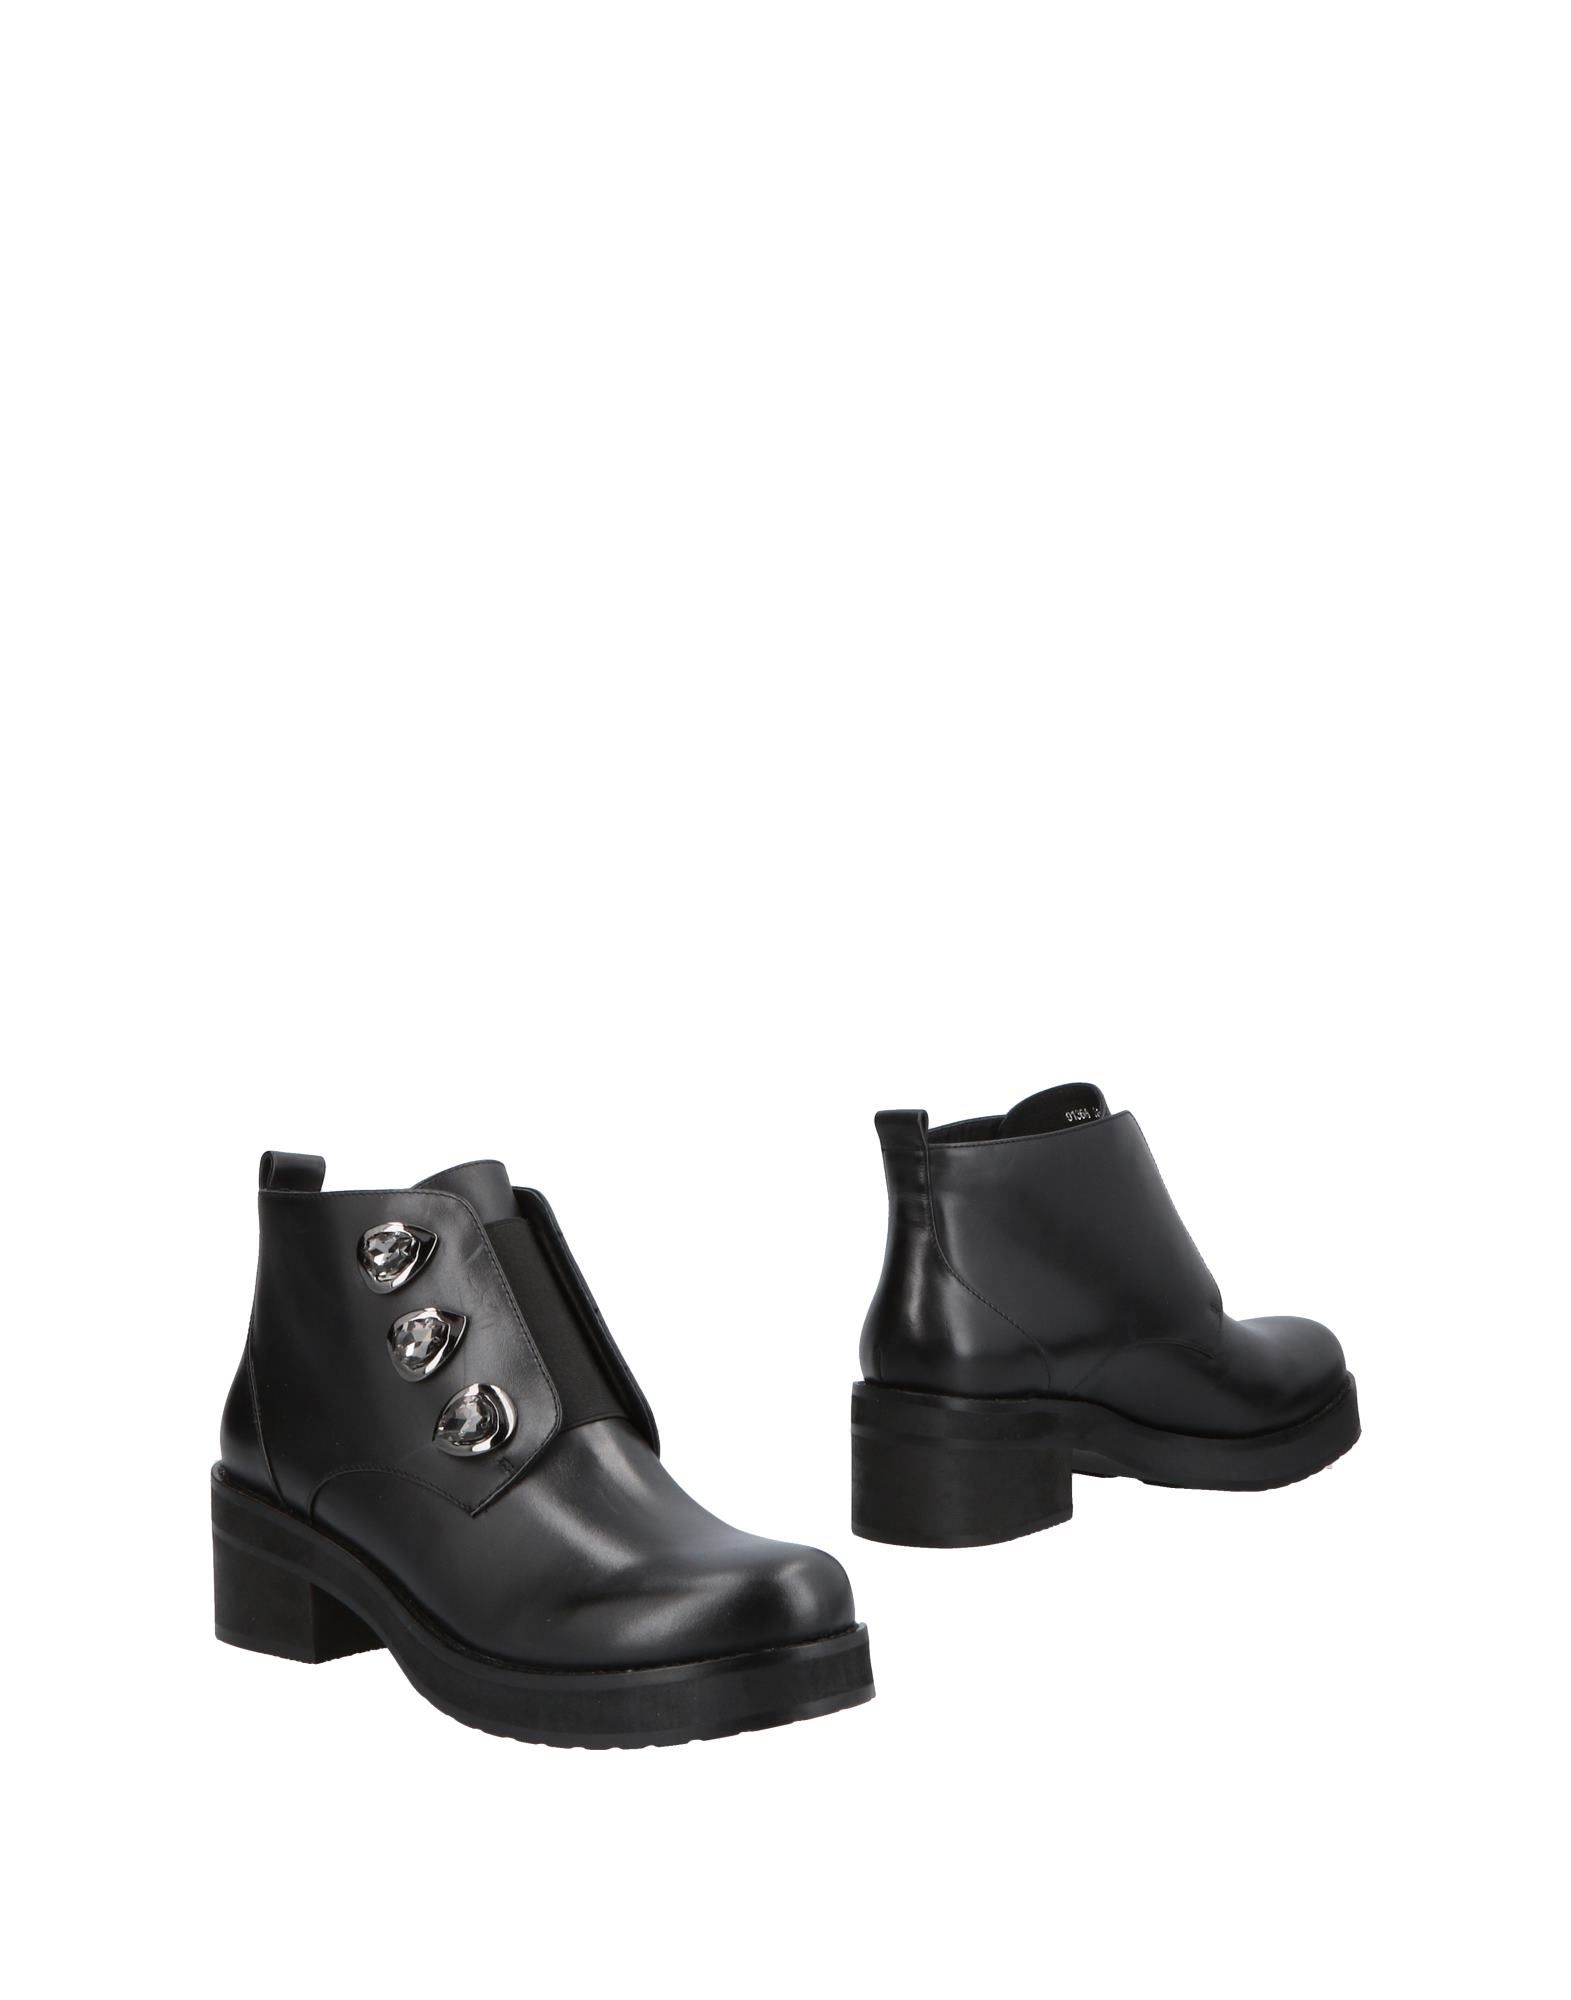 Luciano Barachini Stiefelette Damen beliebte  11503710VP Gute Qualität beliebte Damen Schuhe 4f84e8